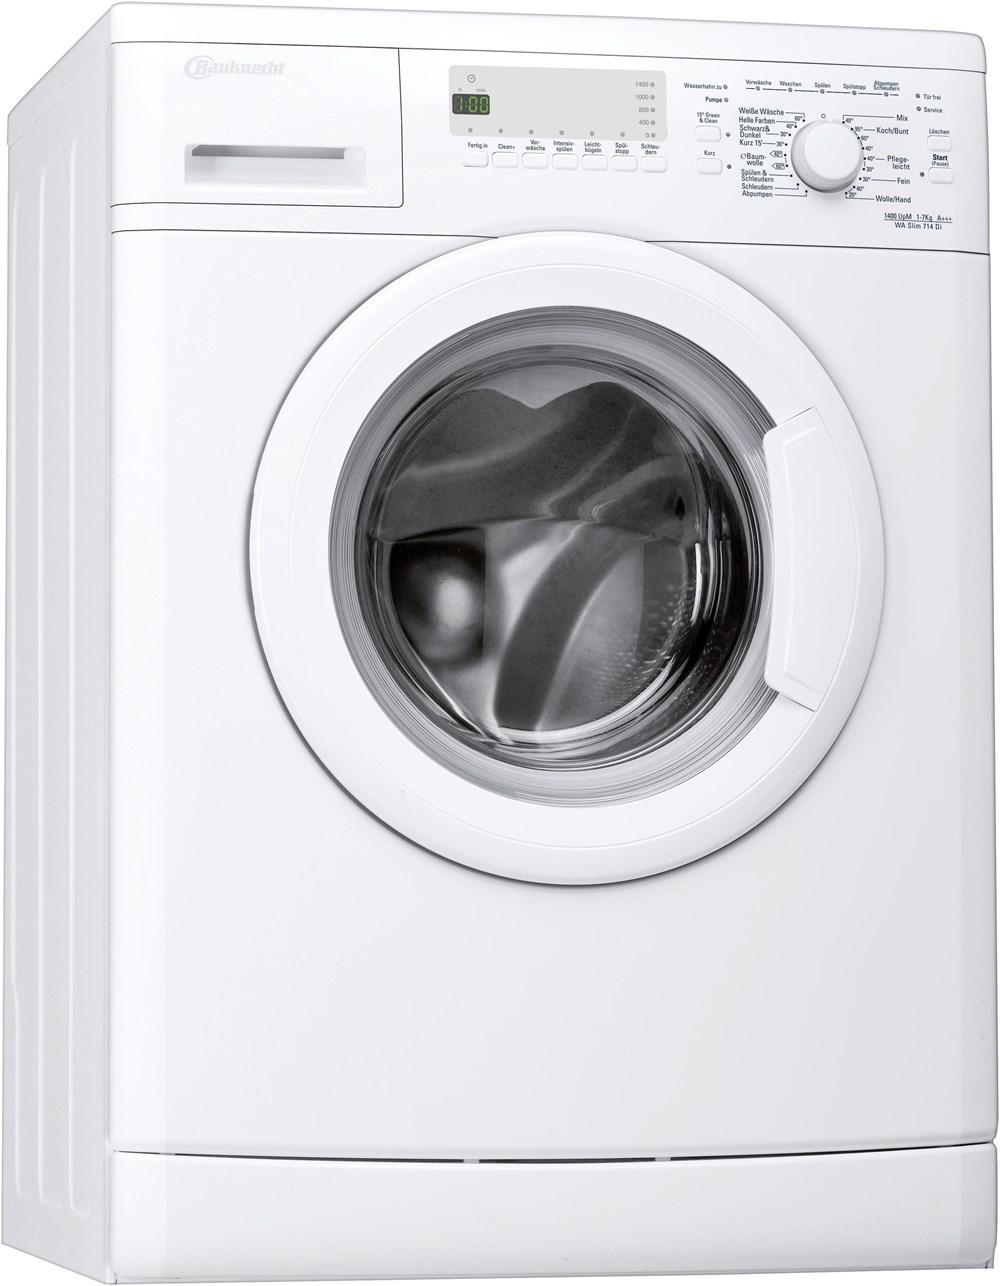 Bauknecht WA Slim 714 Di Waschmaschine,